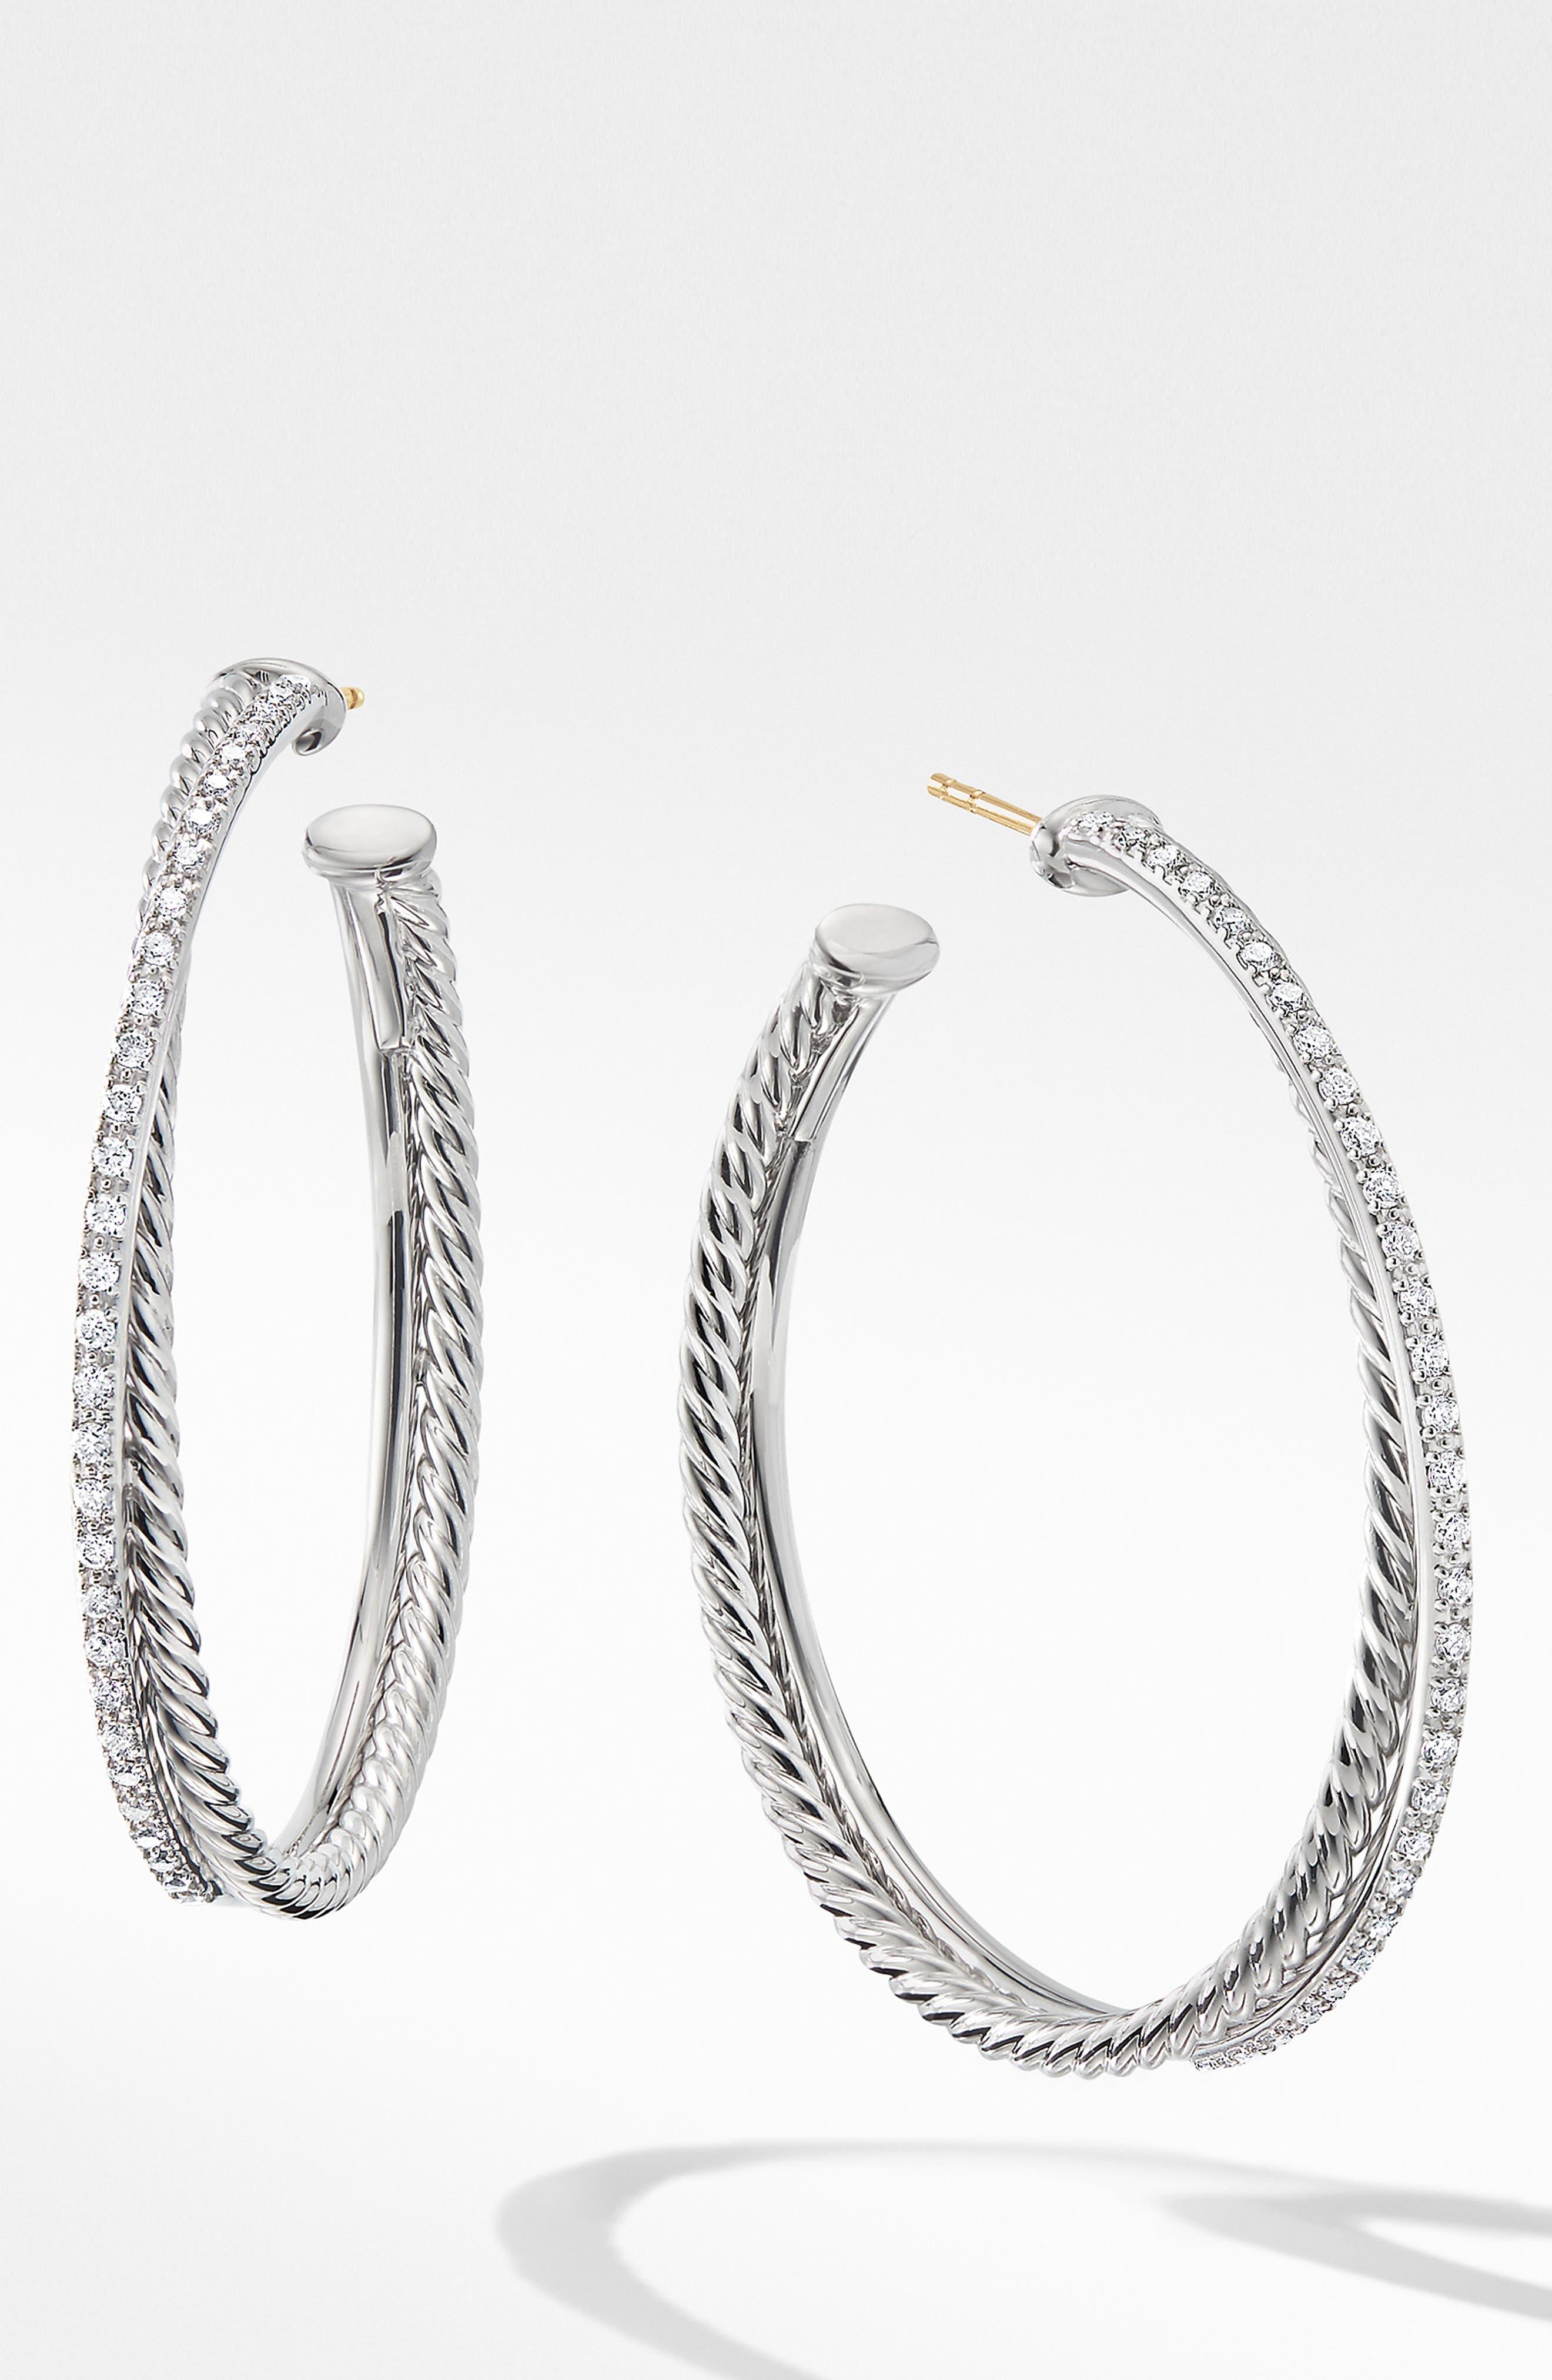 DAVID YURMAN, Extra Large Crossover Hoop Earrings with Diamonds, Main thumbnail 1, color, SILVER/ DIAMOND